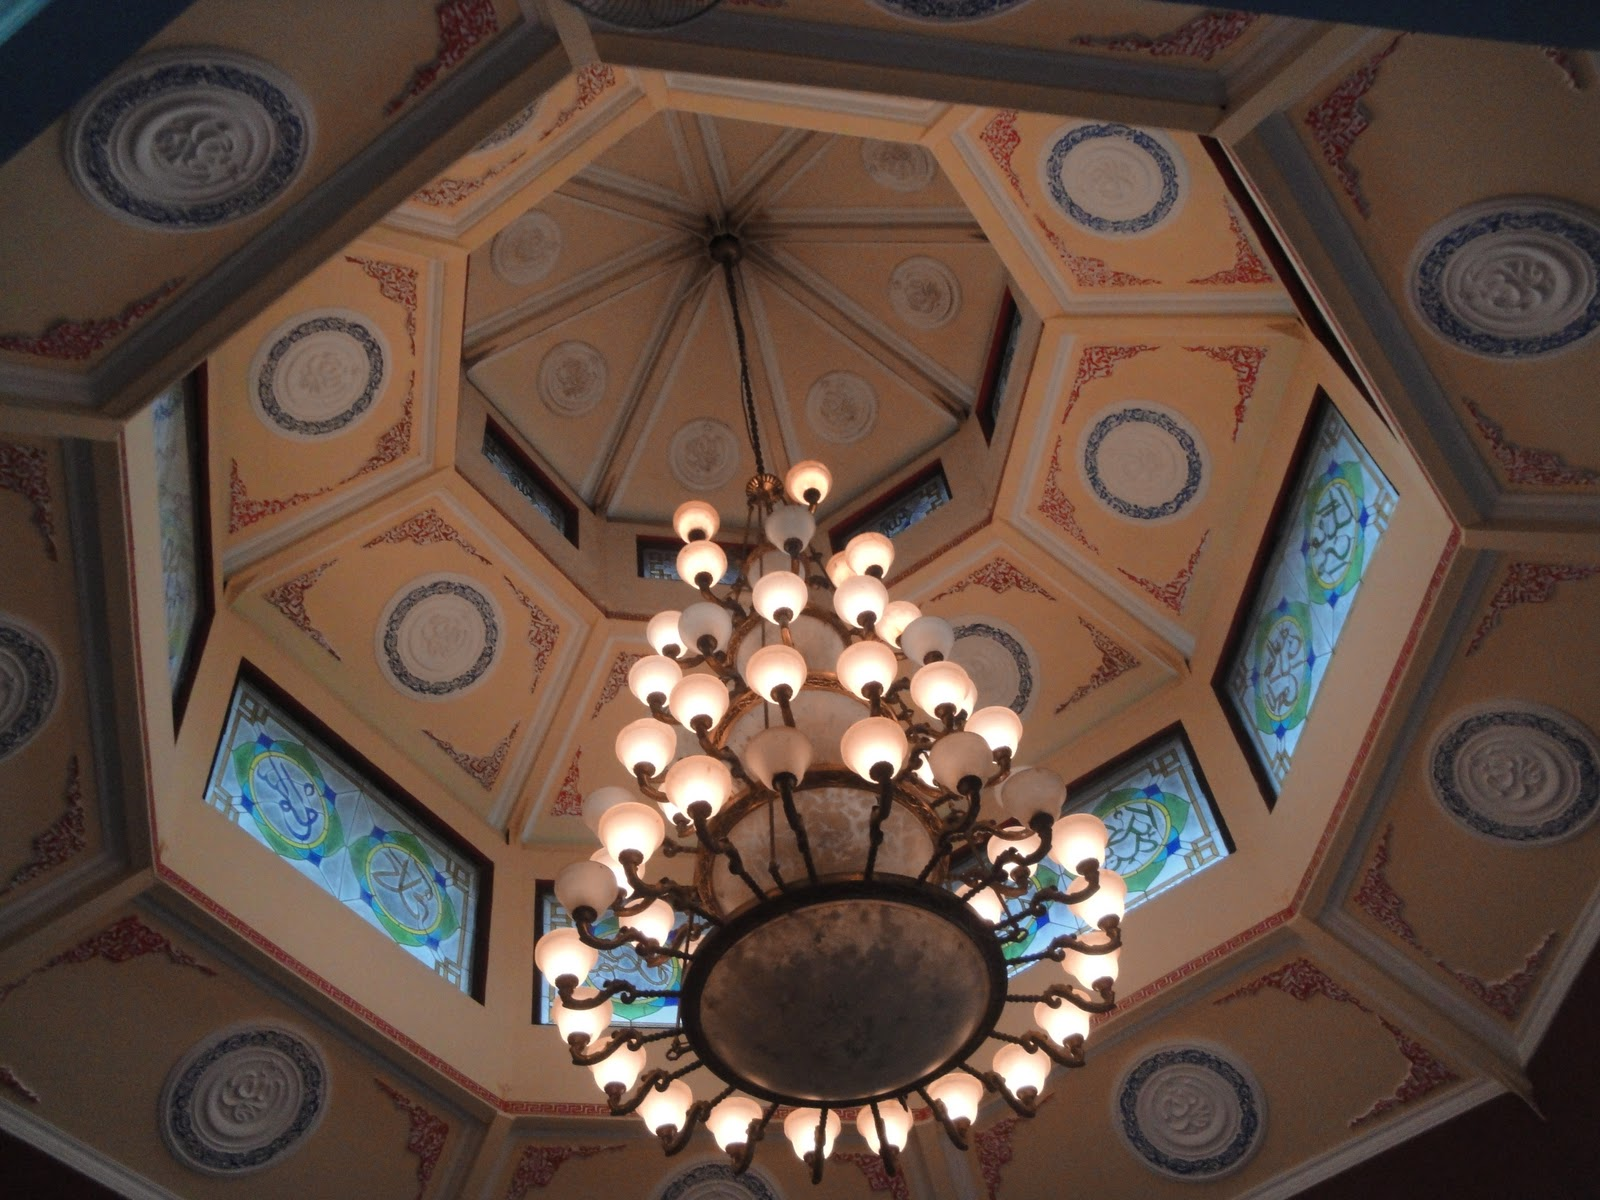 architecture for better life masjid cheng hoo surabaya